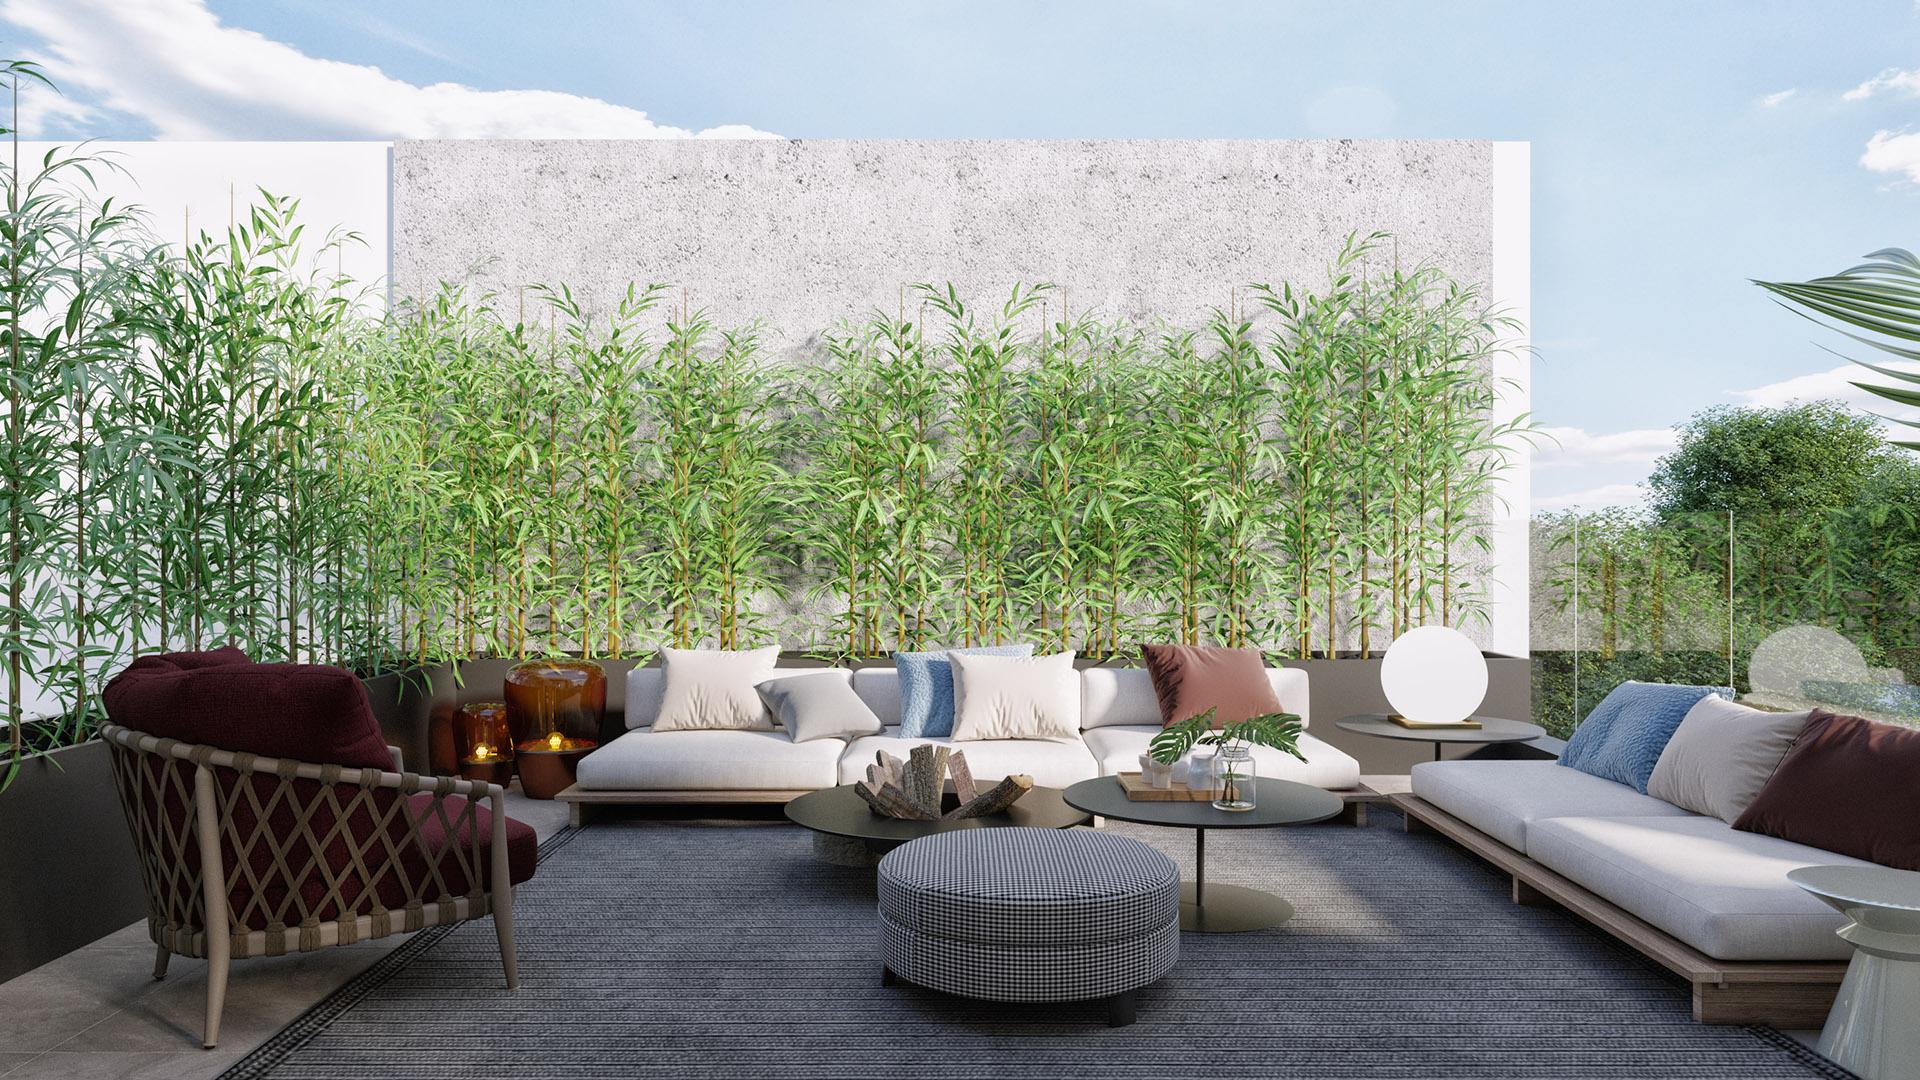 Prodaja stanova Green Hill Dedinje - terasa, penthouse D41.